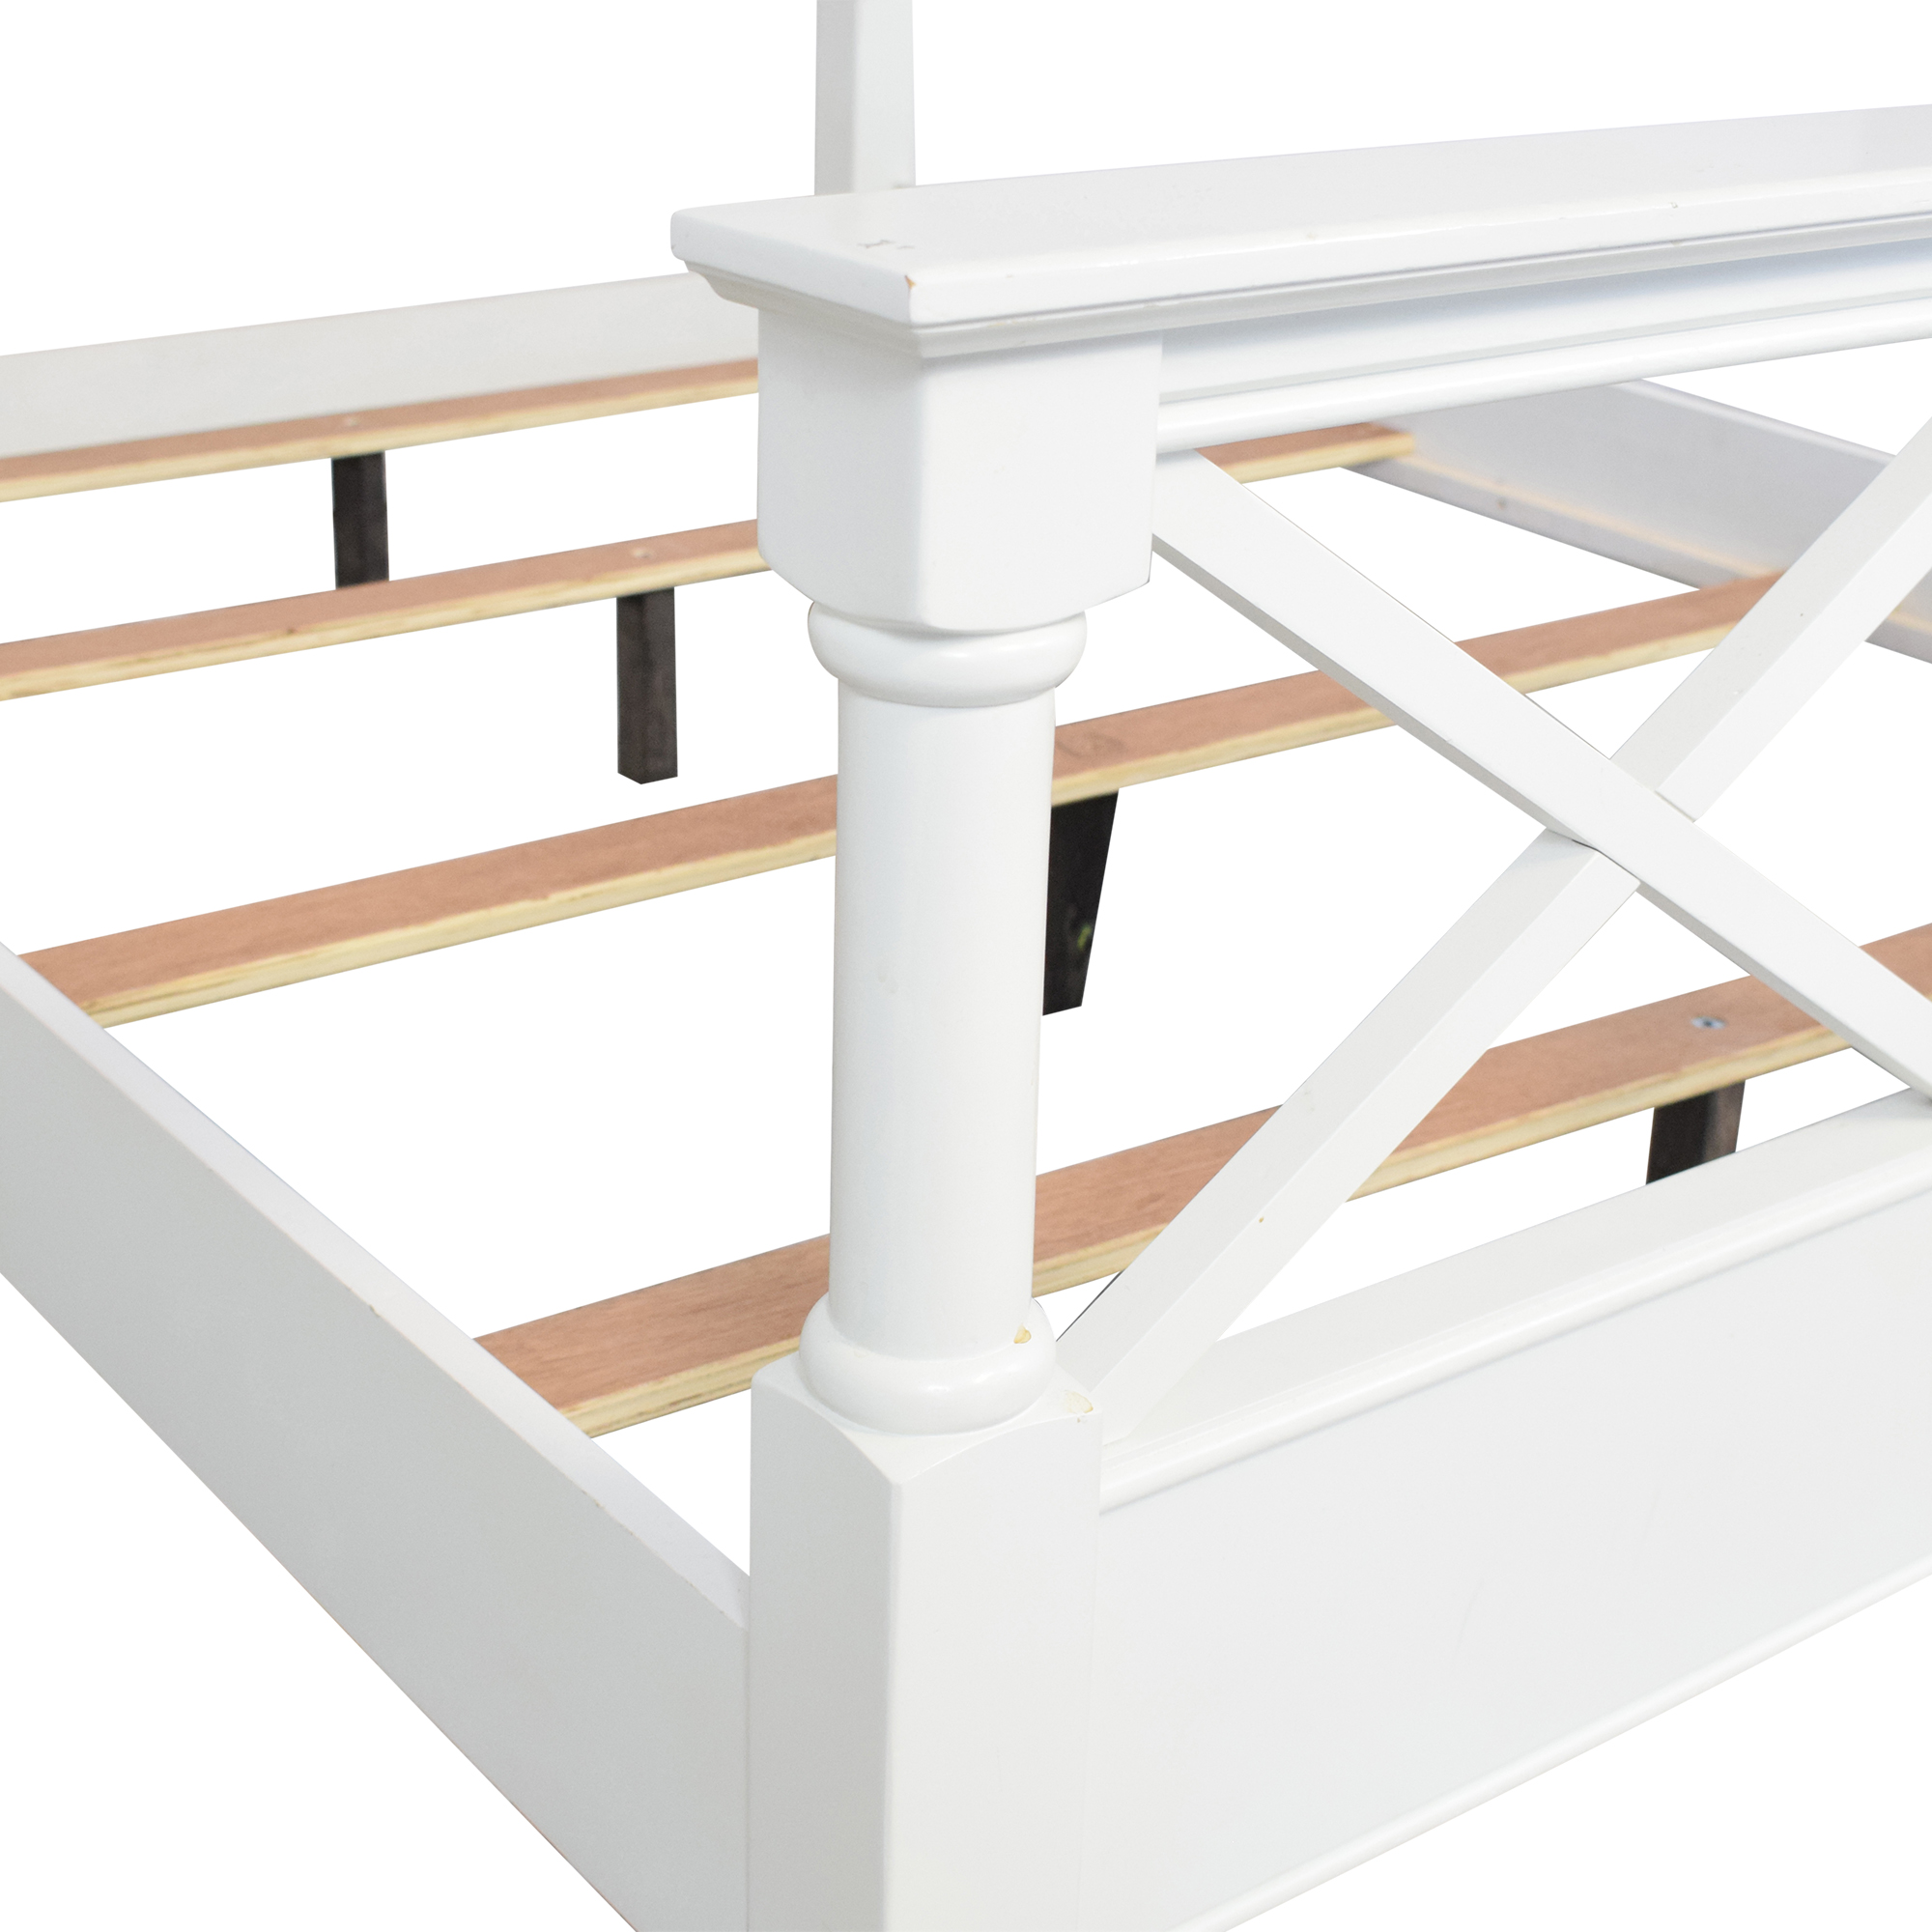 Magnussen Home Magnussen Home Queen Bed Frame used